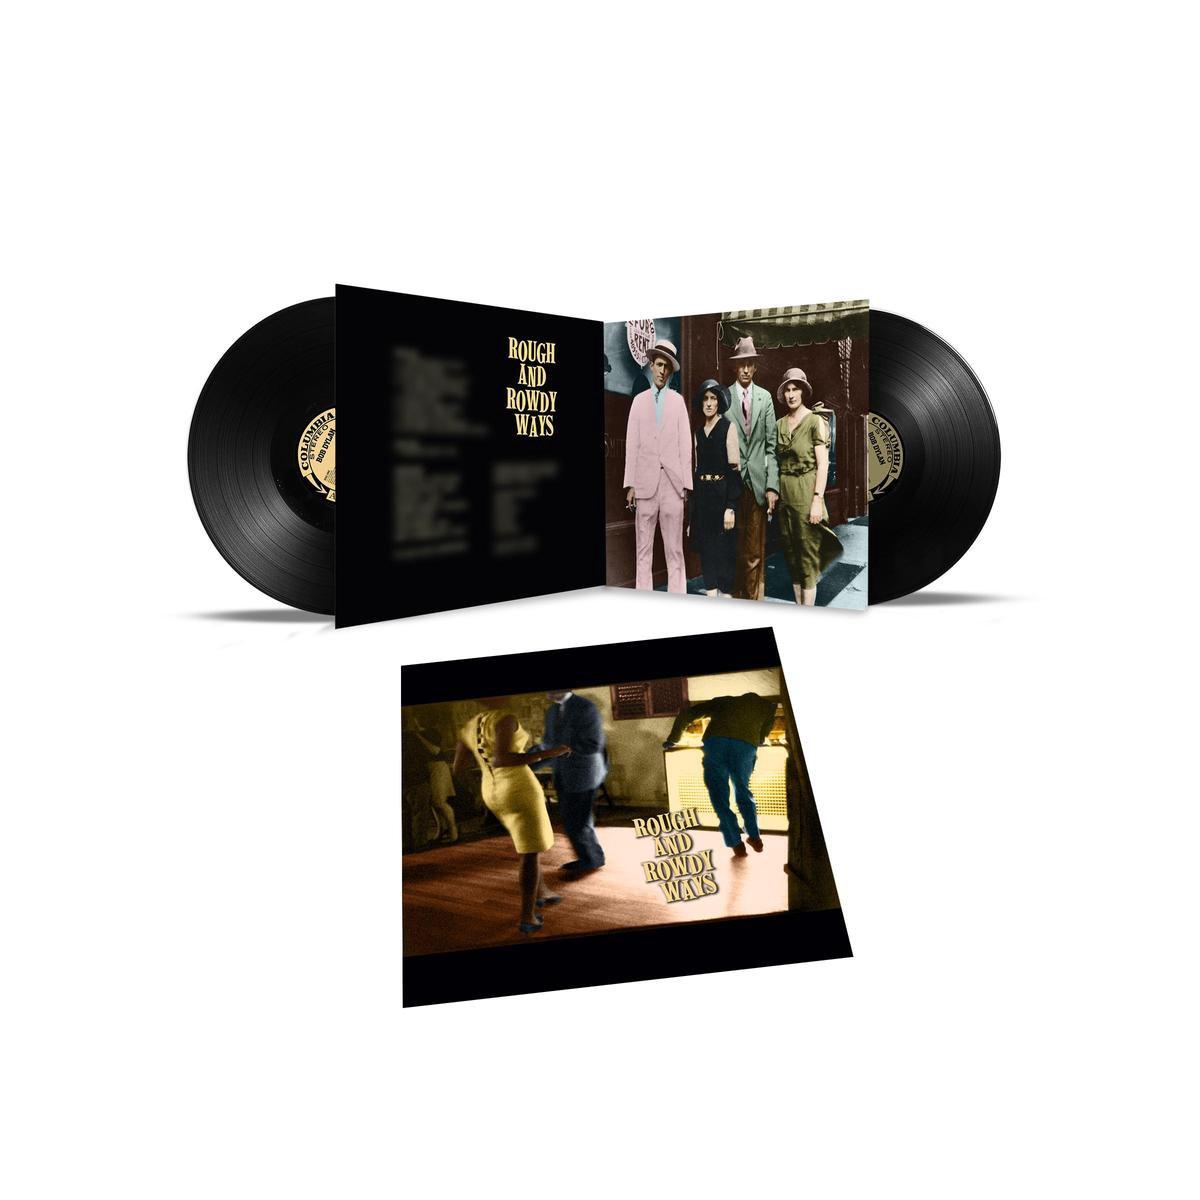 Rough And Rowdy Ways - Vinyl